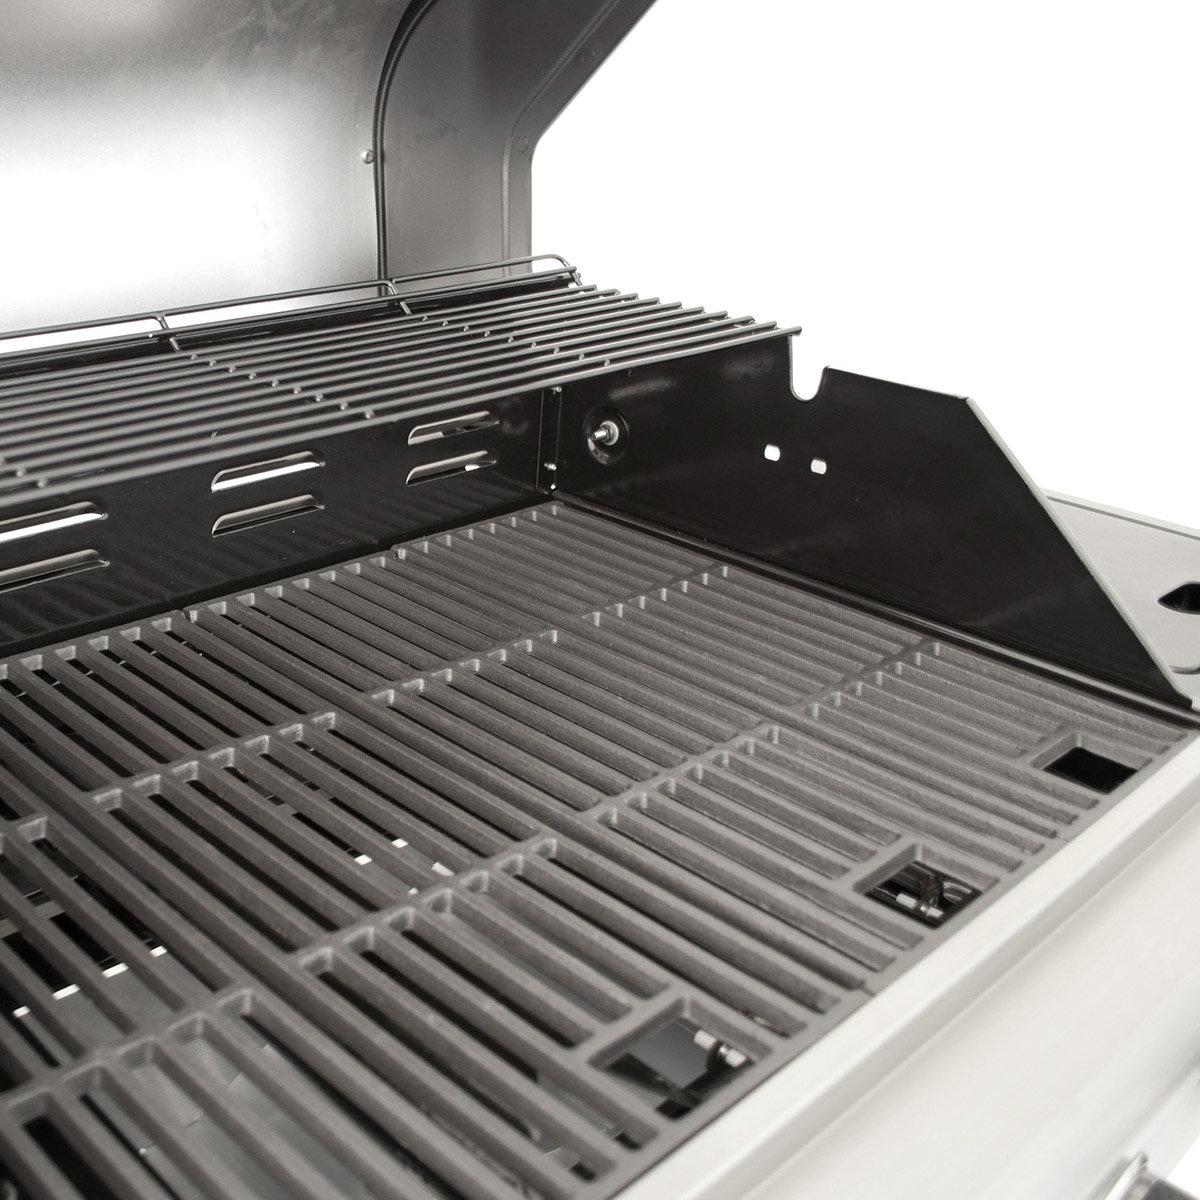 Landmann® Gasgrill-Wagen Triton PTS 4.1, silber | #5